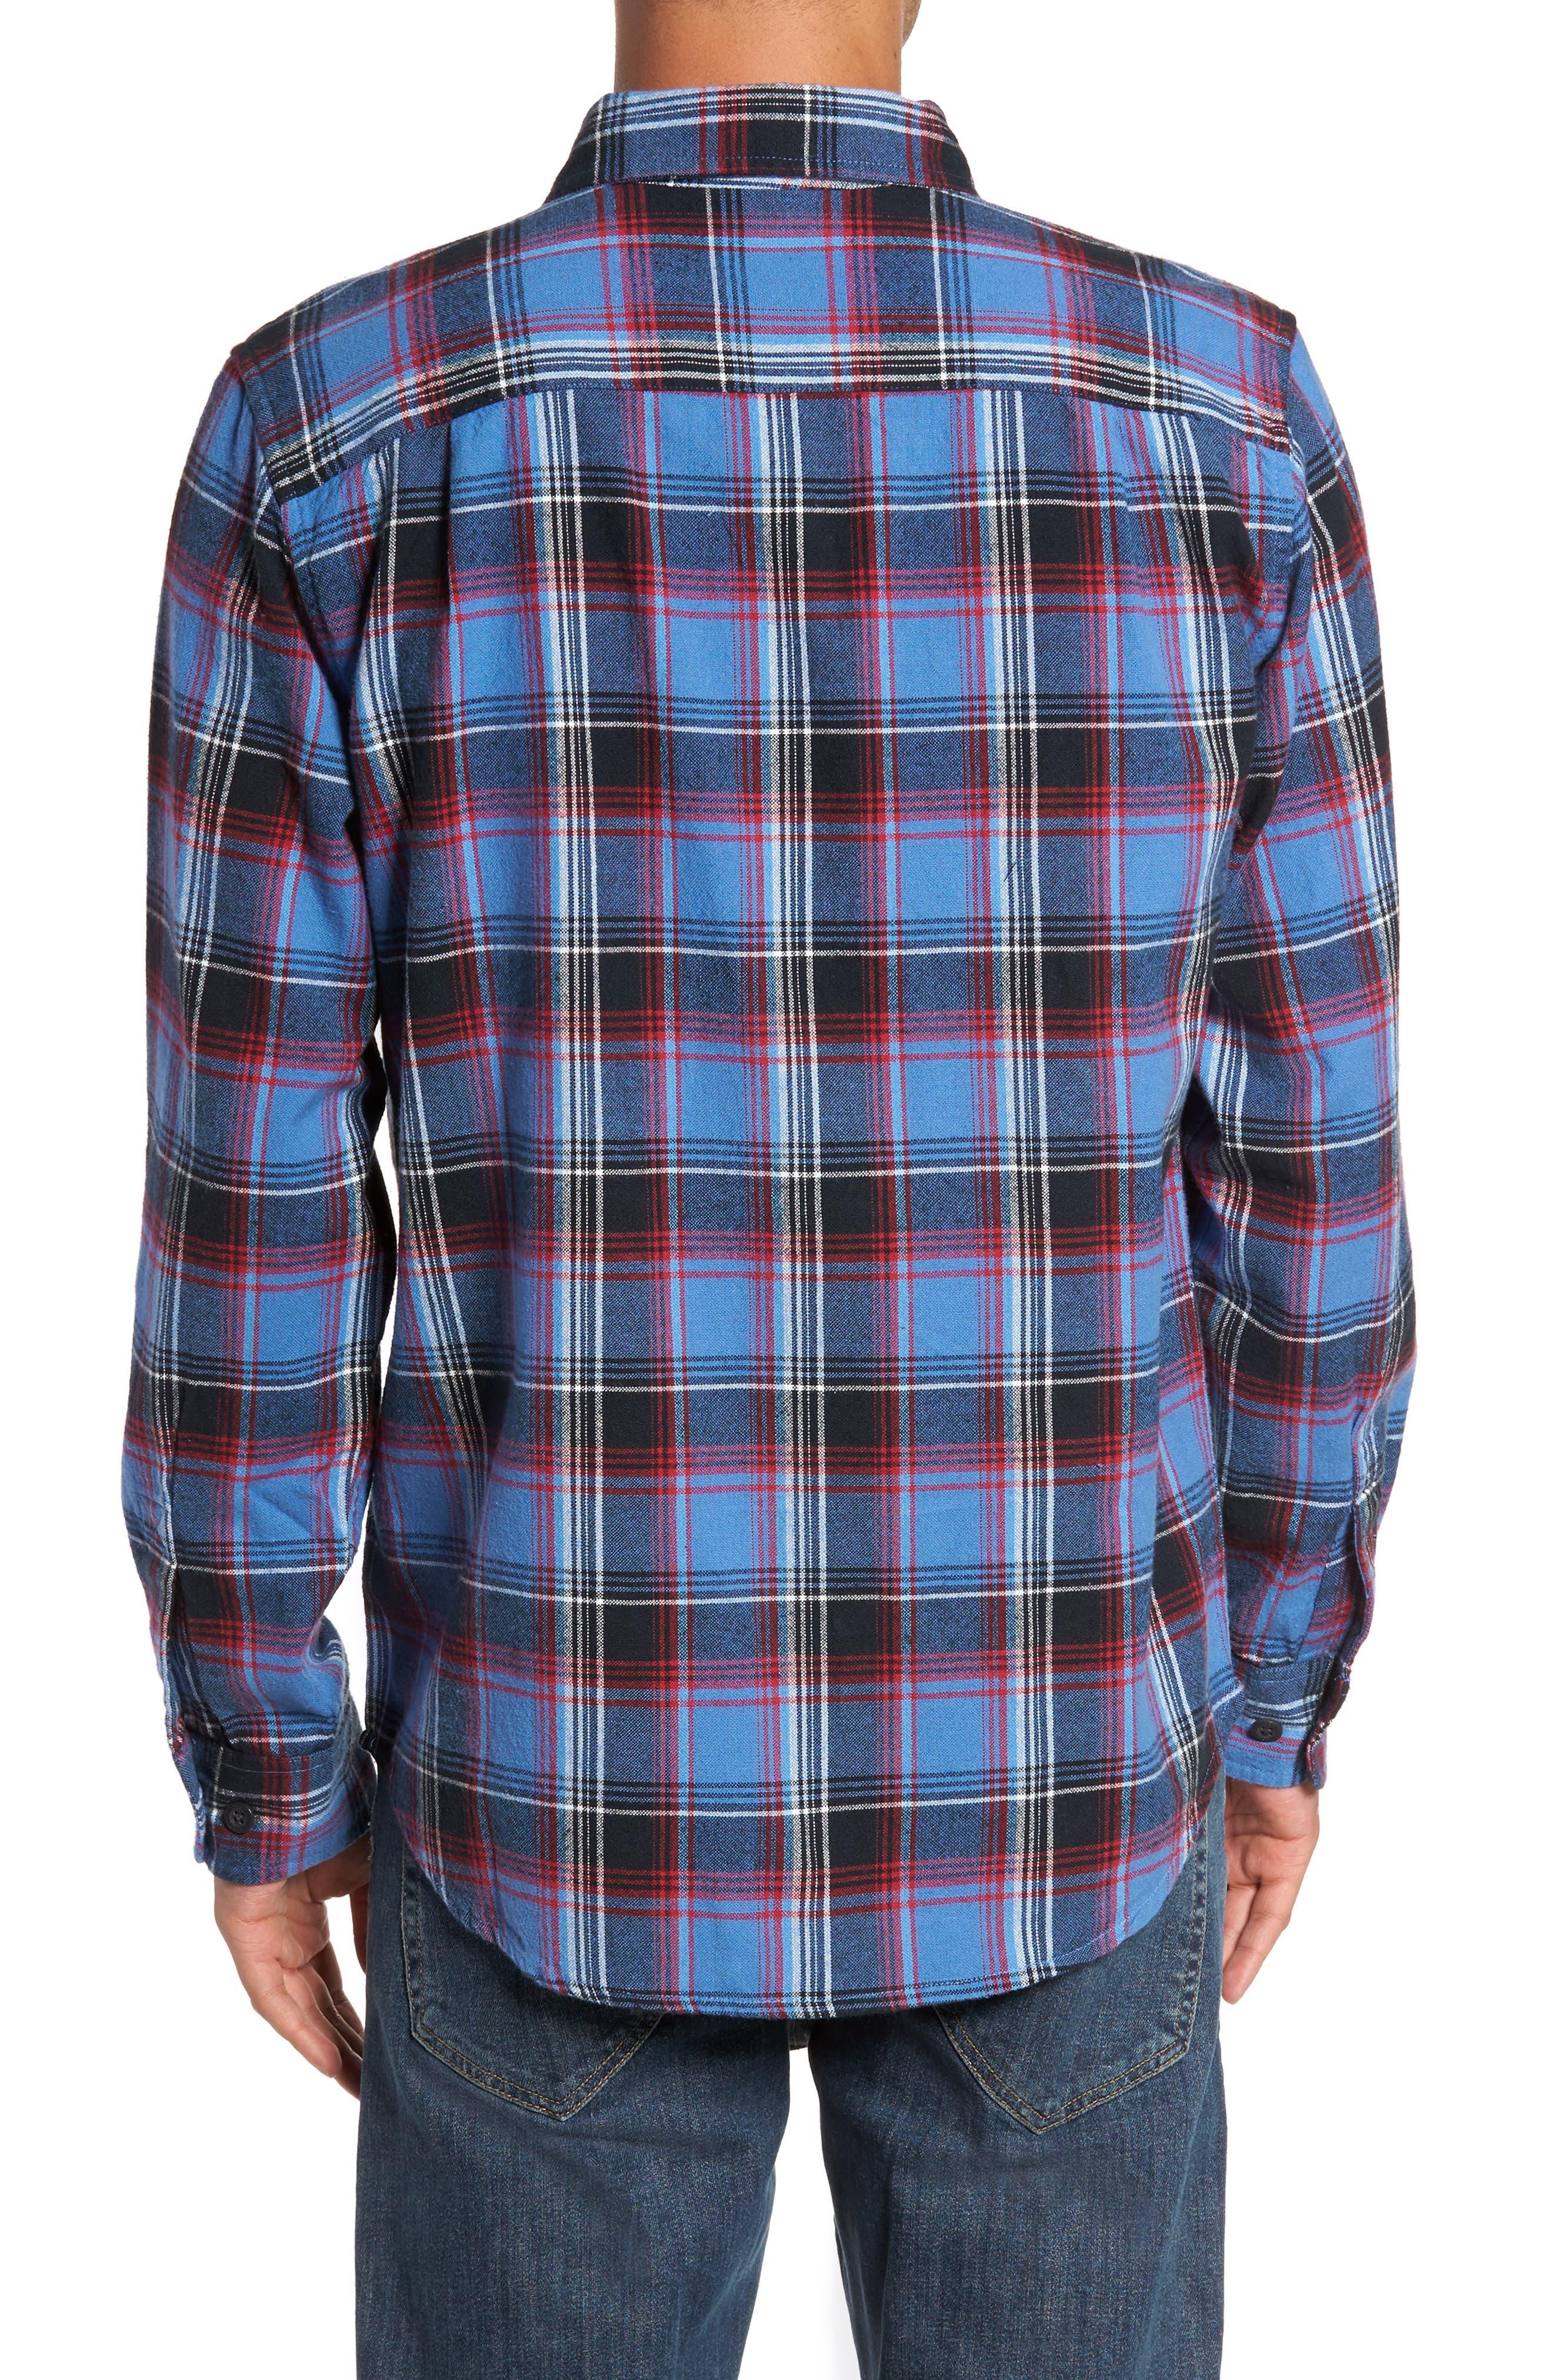 Marvyn Plaid Woven Shirt,                             Alternate thumbnail 2, color,                             410